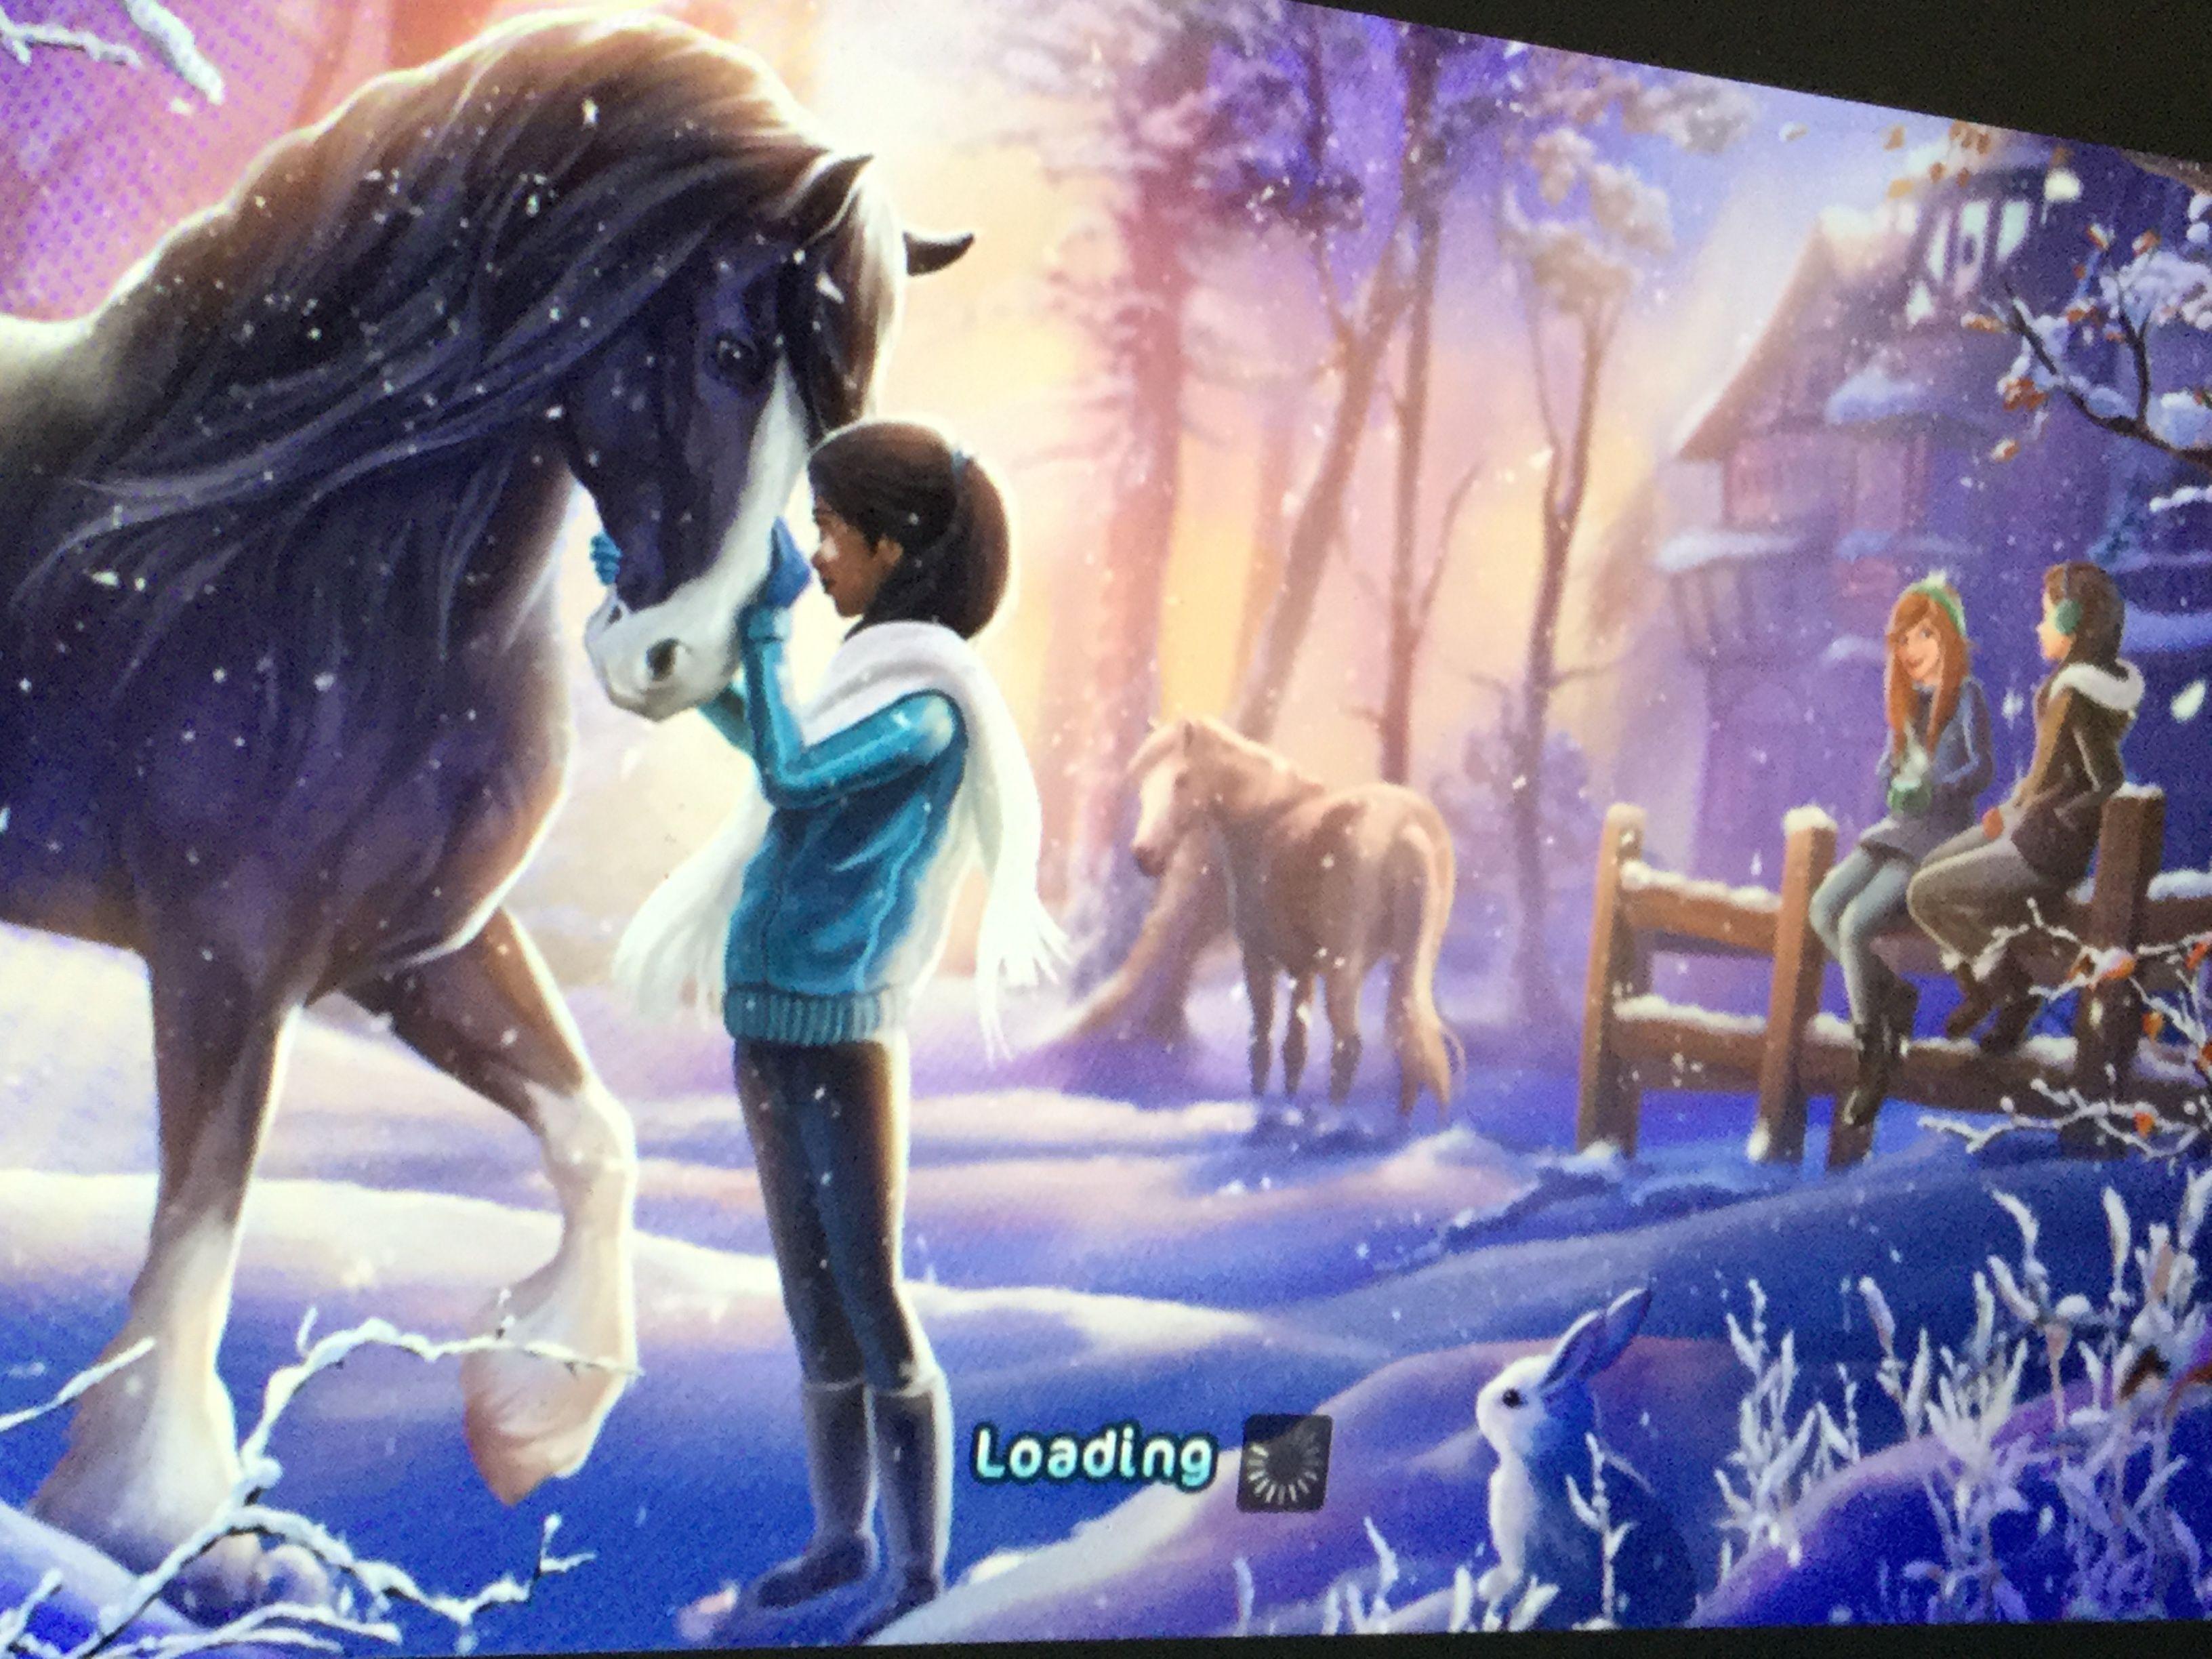 horses videos board games